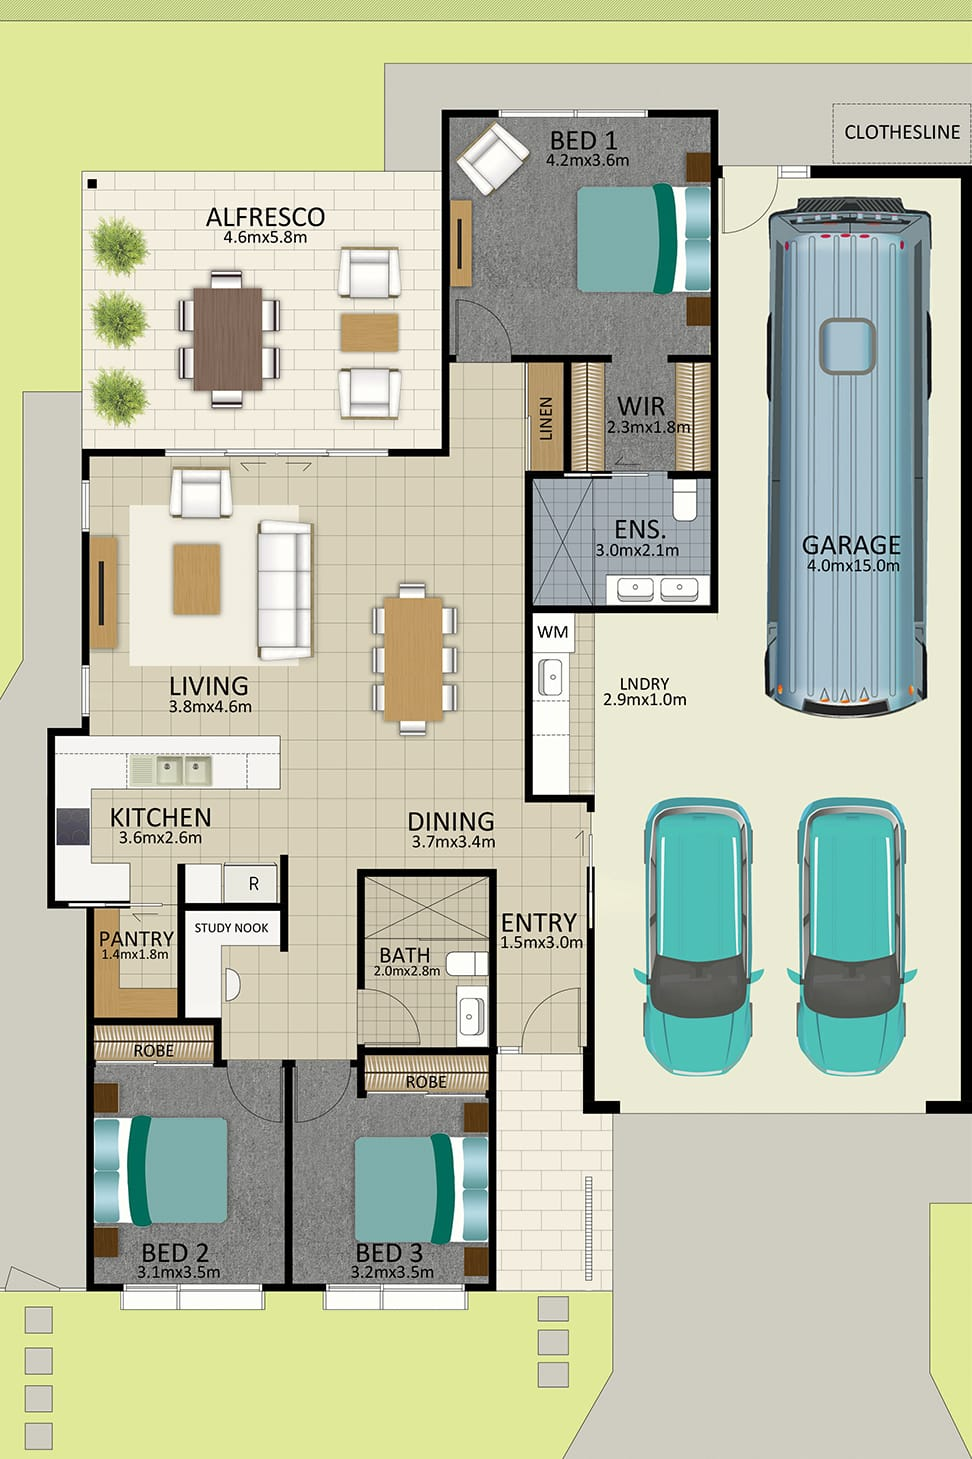 LR WEB LAT25 Floorplan LOT 168 Watson MK3 JUL19 V2 - Lot 168